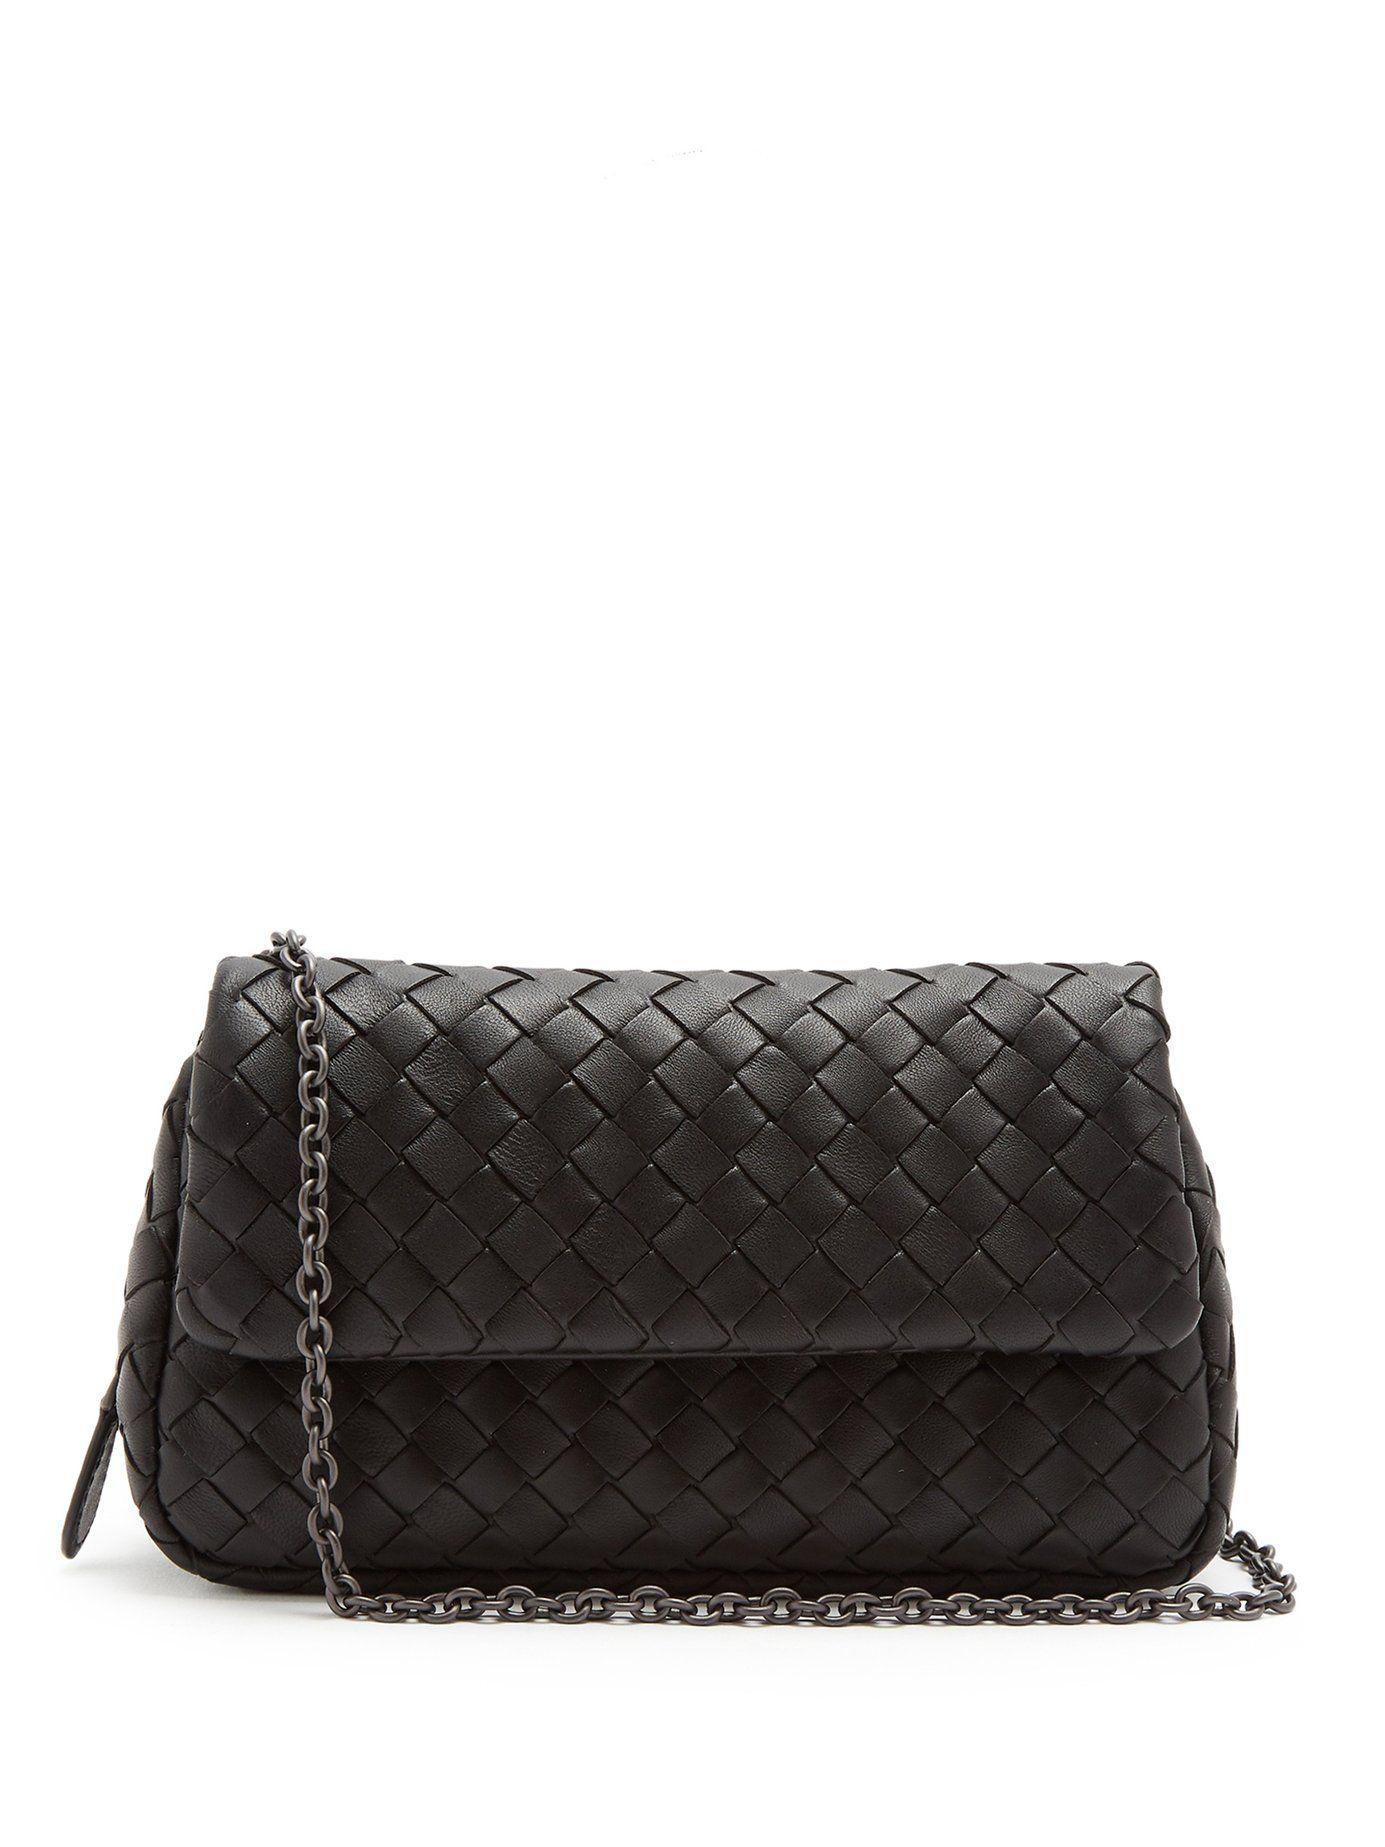 5cdaf576cc Intrecciato mini leather cross-body bag